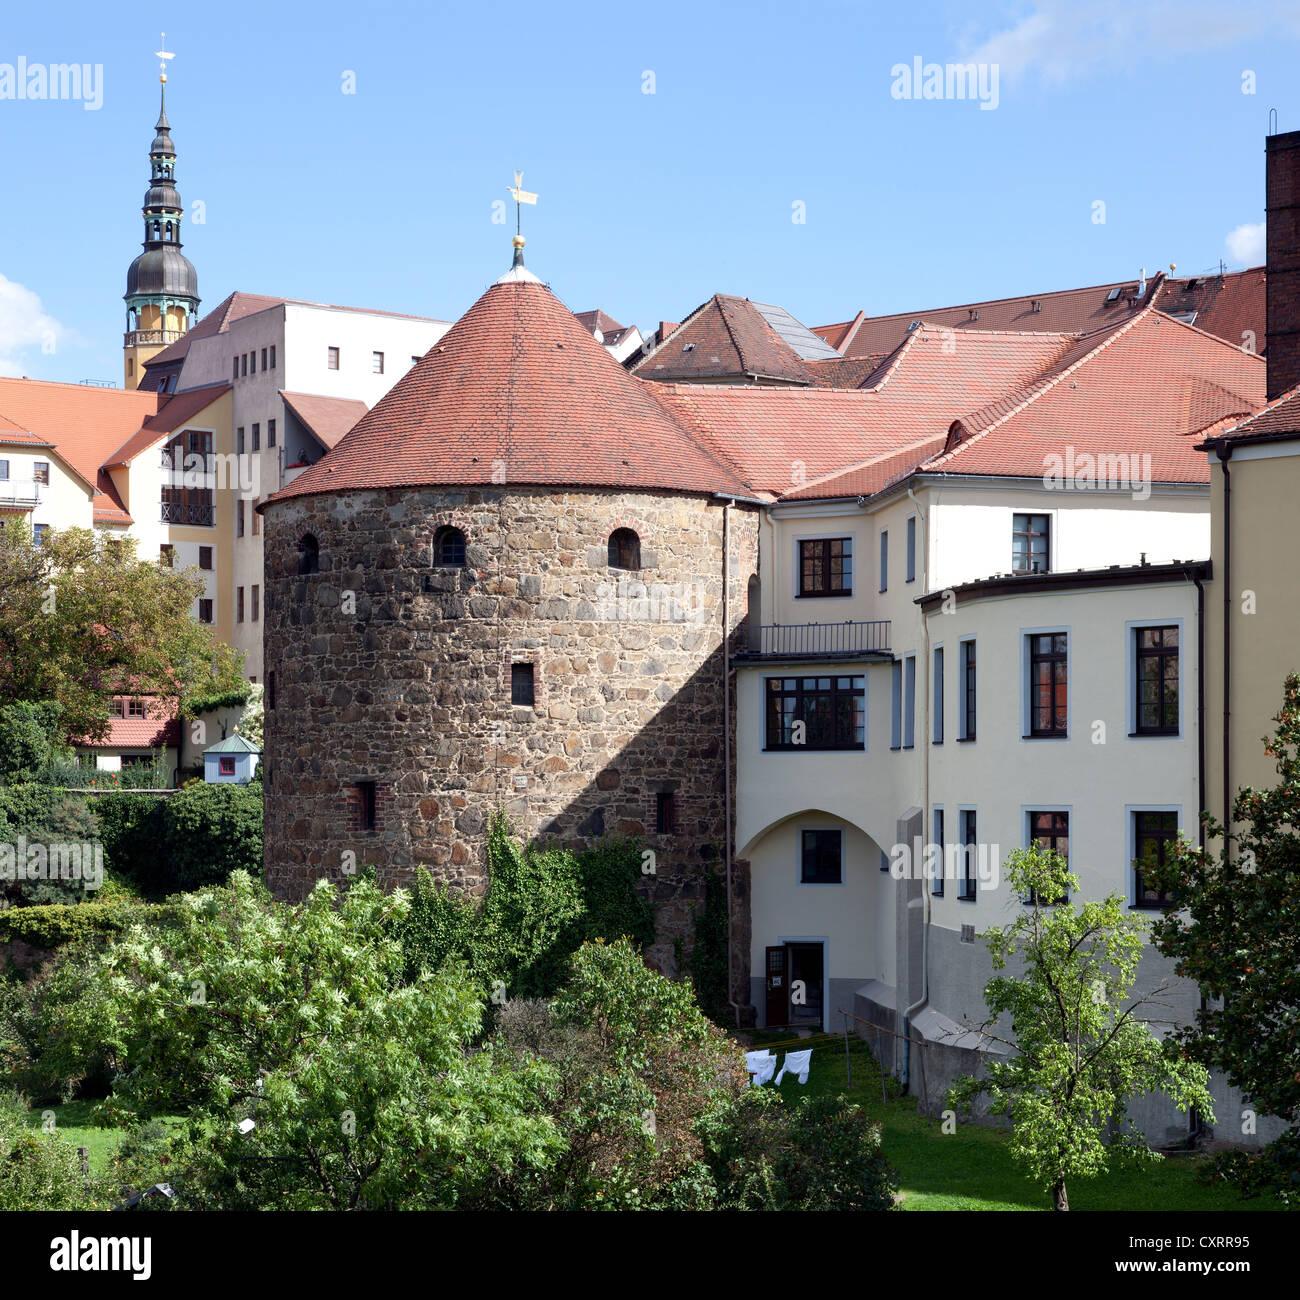 Roehrscheidtbastei bastion, Bautzen, Budysin, Lusatia, Upper Lusatia, Saxony, Germany, Europe, PublicGround - Stock Image